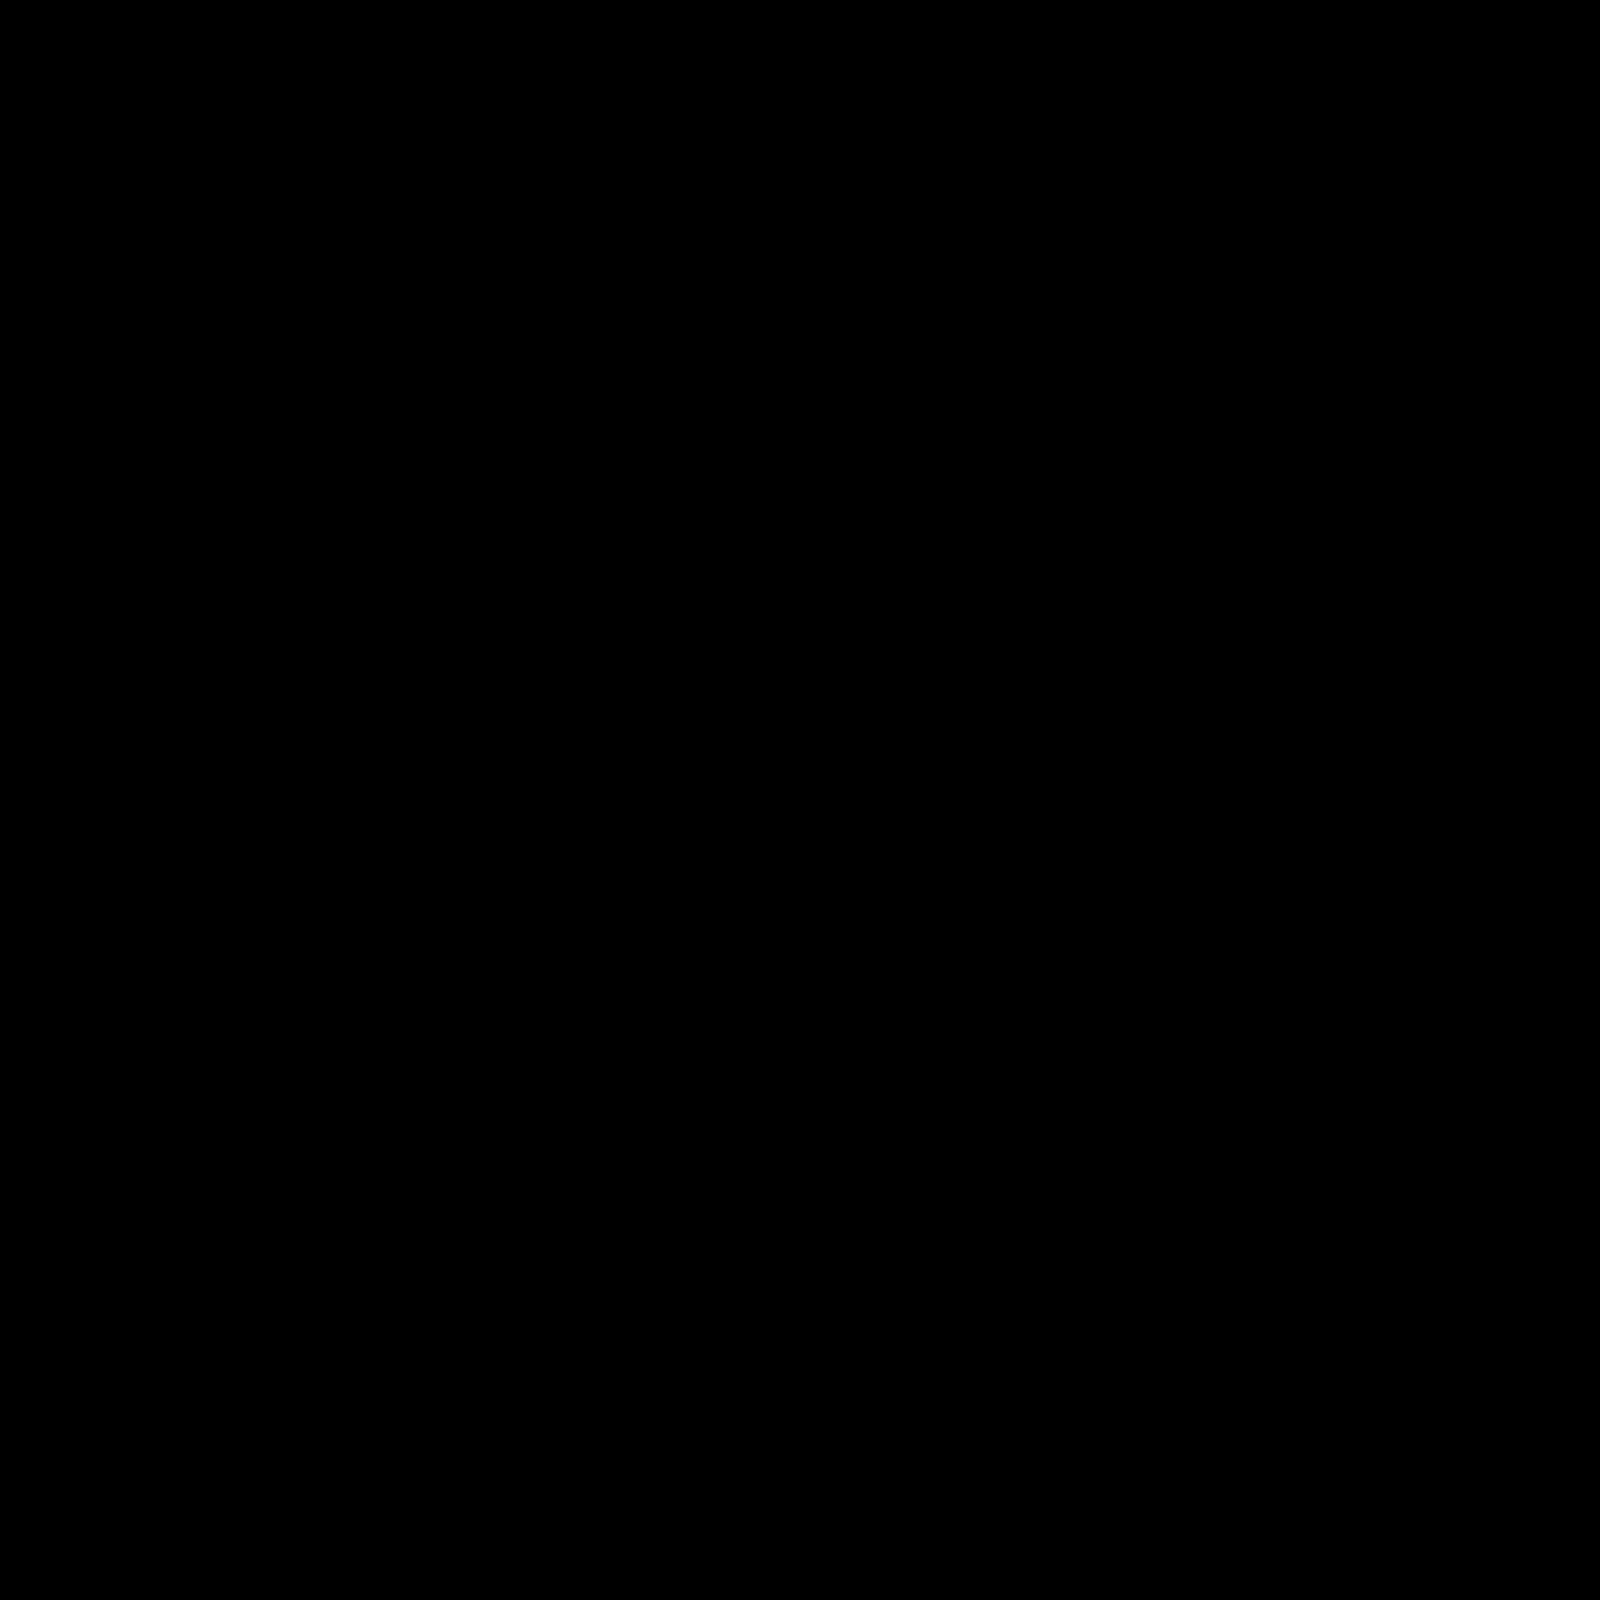 Sprint Iteration icon